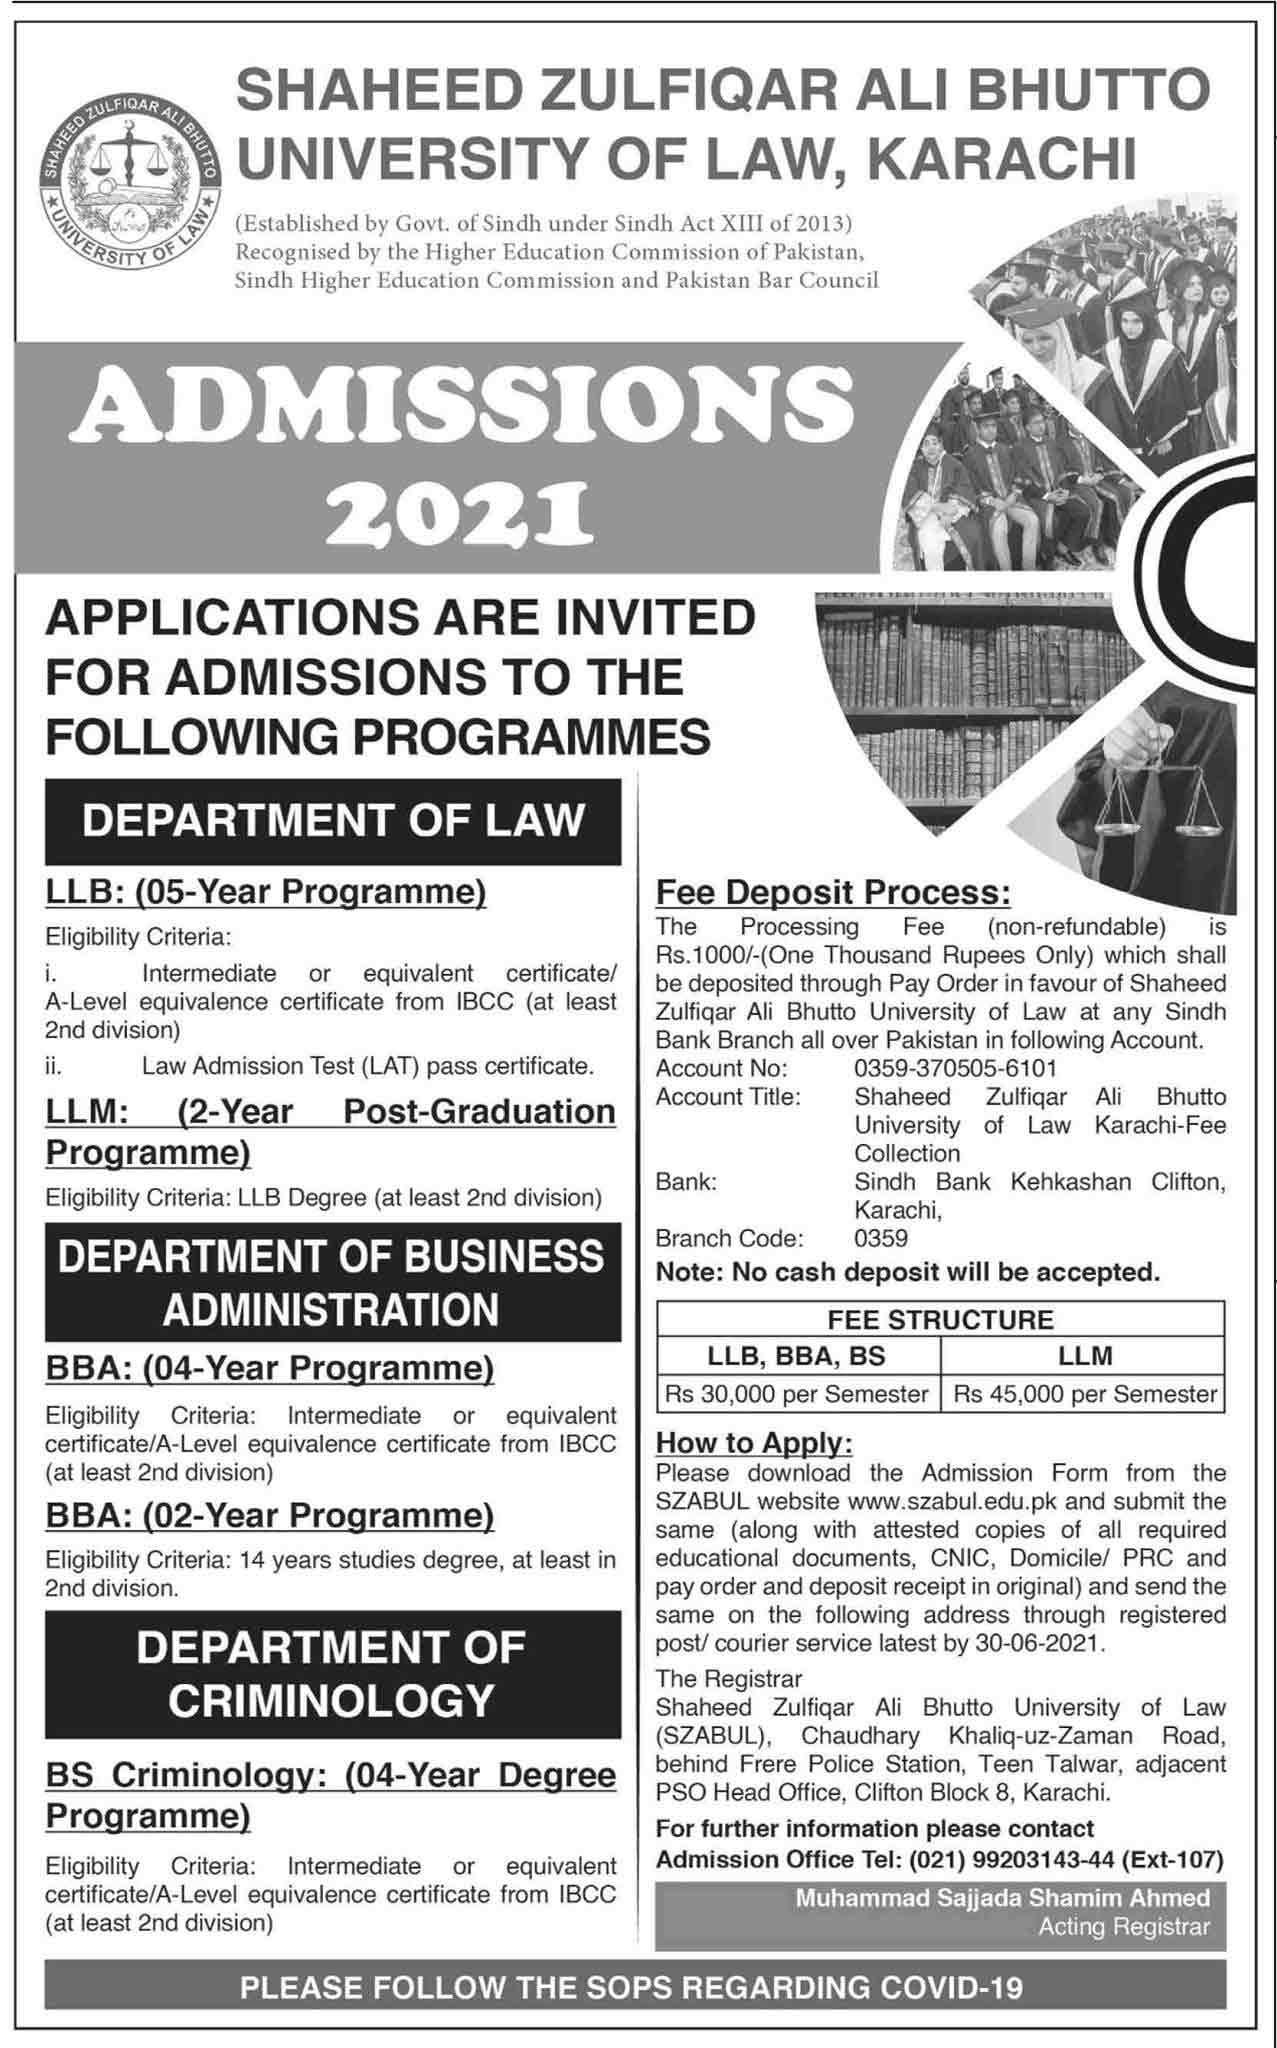 Shaheed-Zulfiqar-Ali-Bhutto-Law-College-Admission-2021